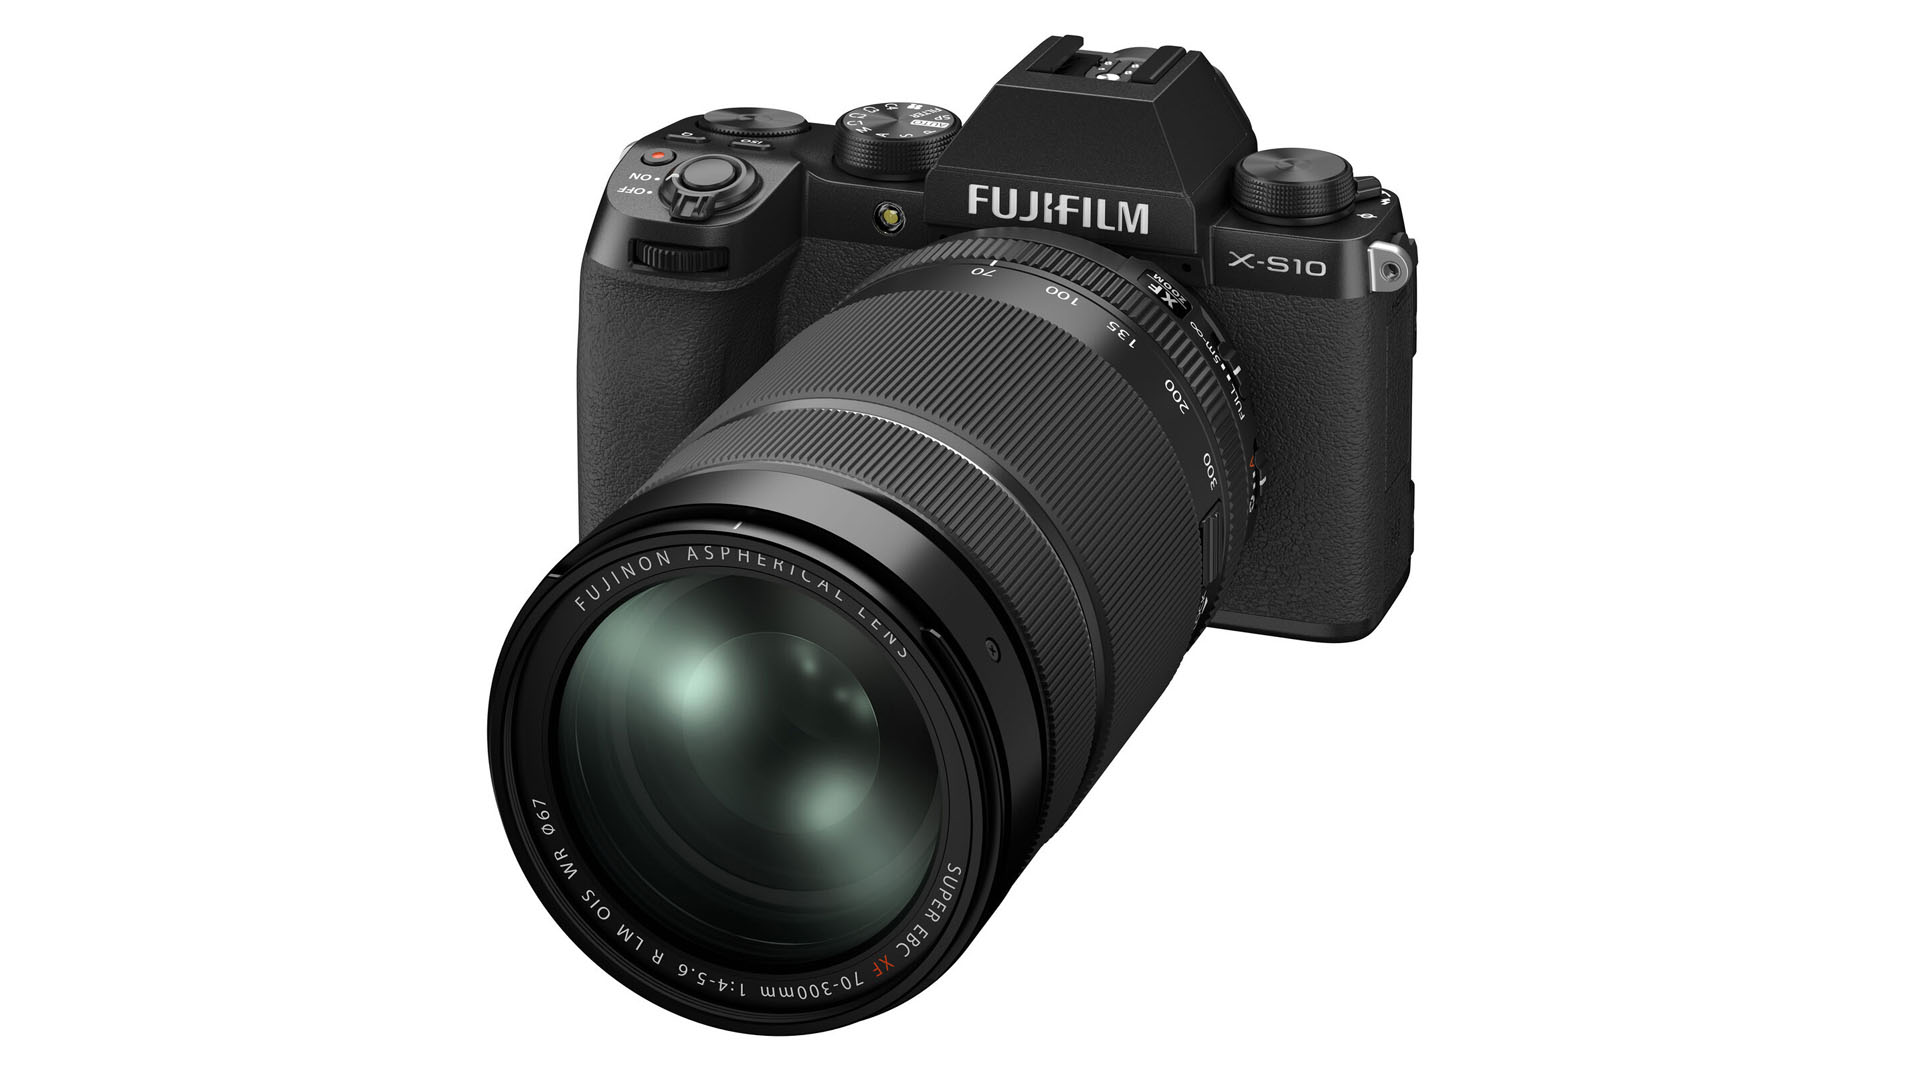 FUJINON XF 70-300MM F4-5.6 R LM OIS WR packshot